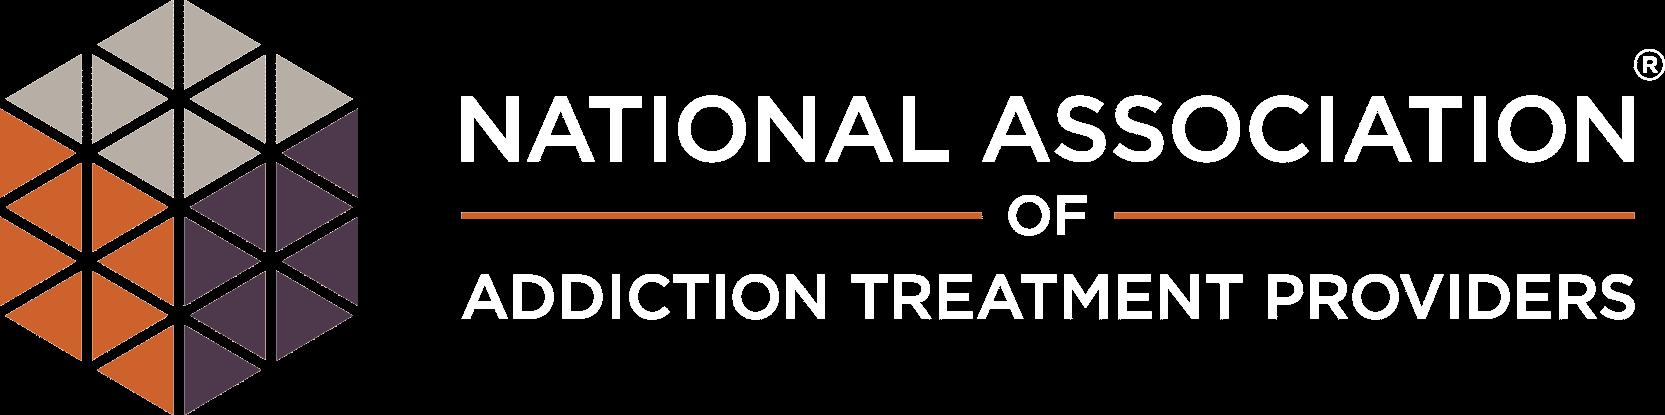 National-Association-of-Addiction-Treatment-Providers-Logo